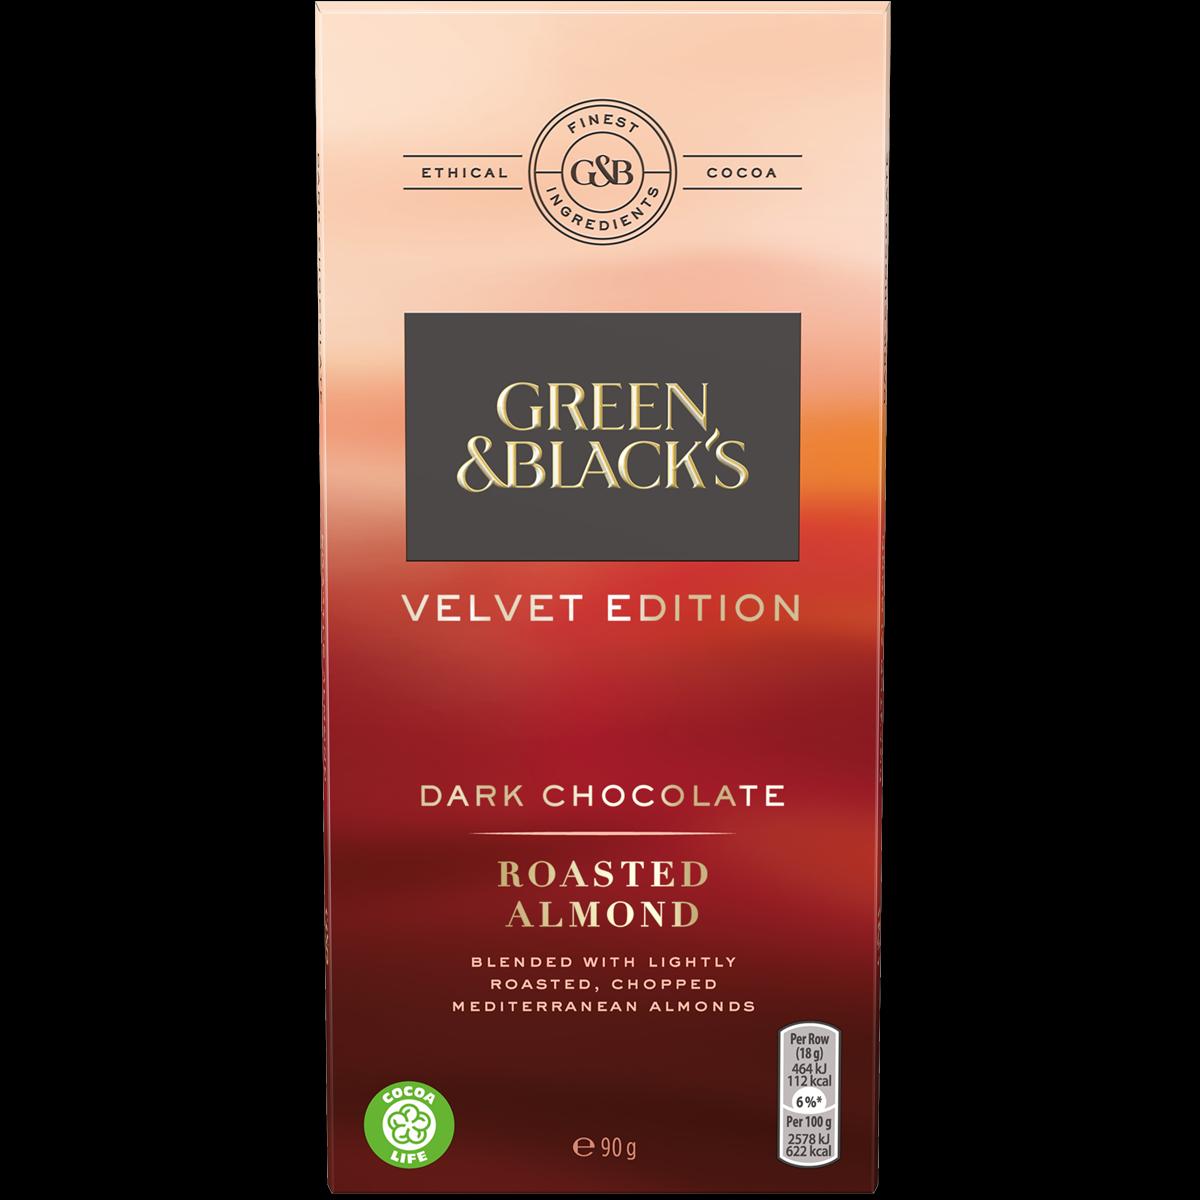 Roasted Almond Dark Chocolate 90g Bar (Box of 18)